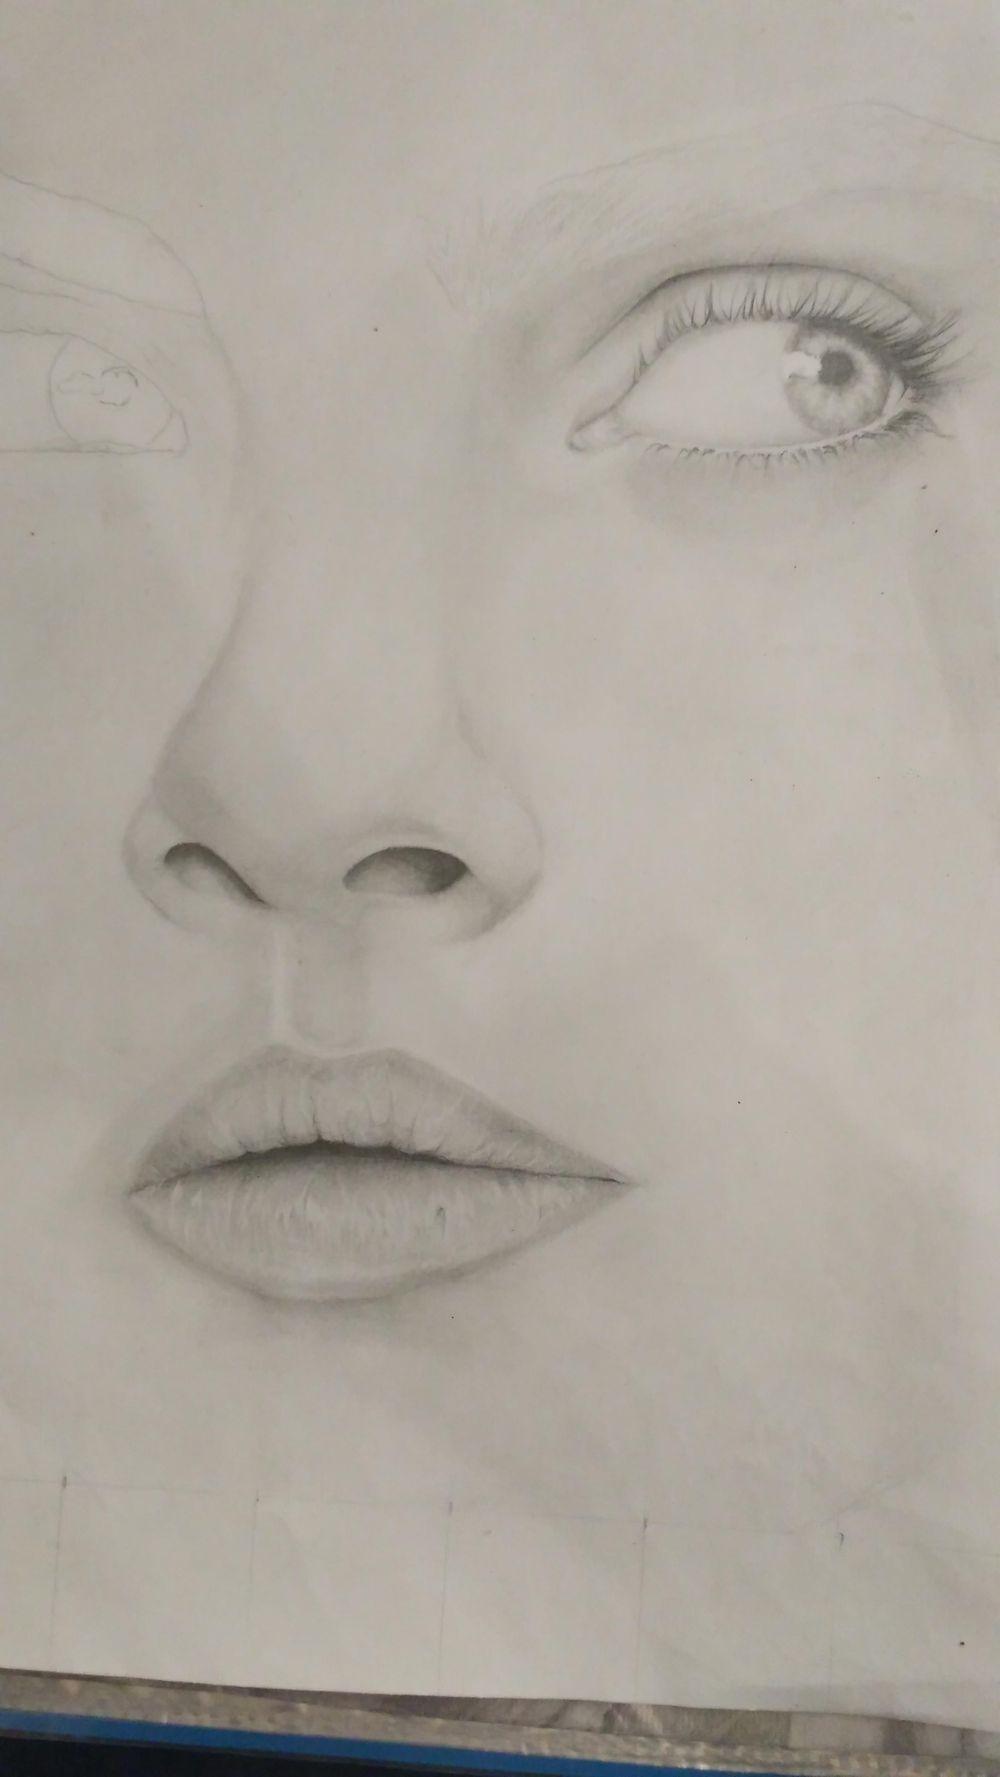 Cara Delevingne - image 5 - student project